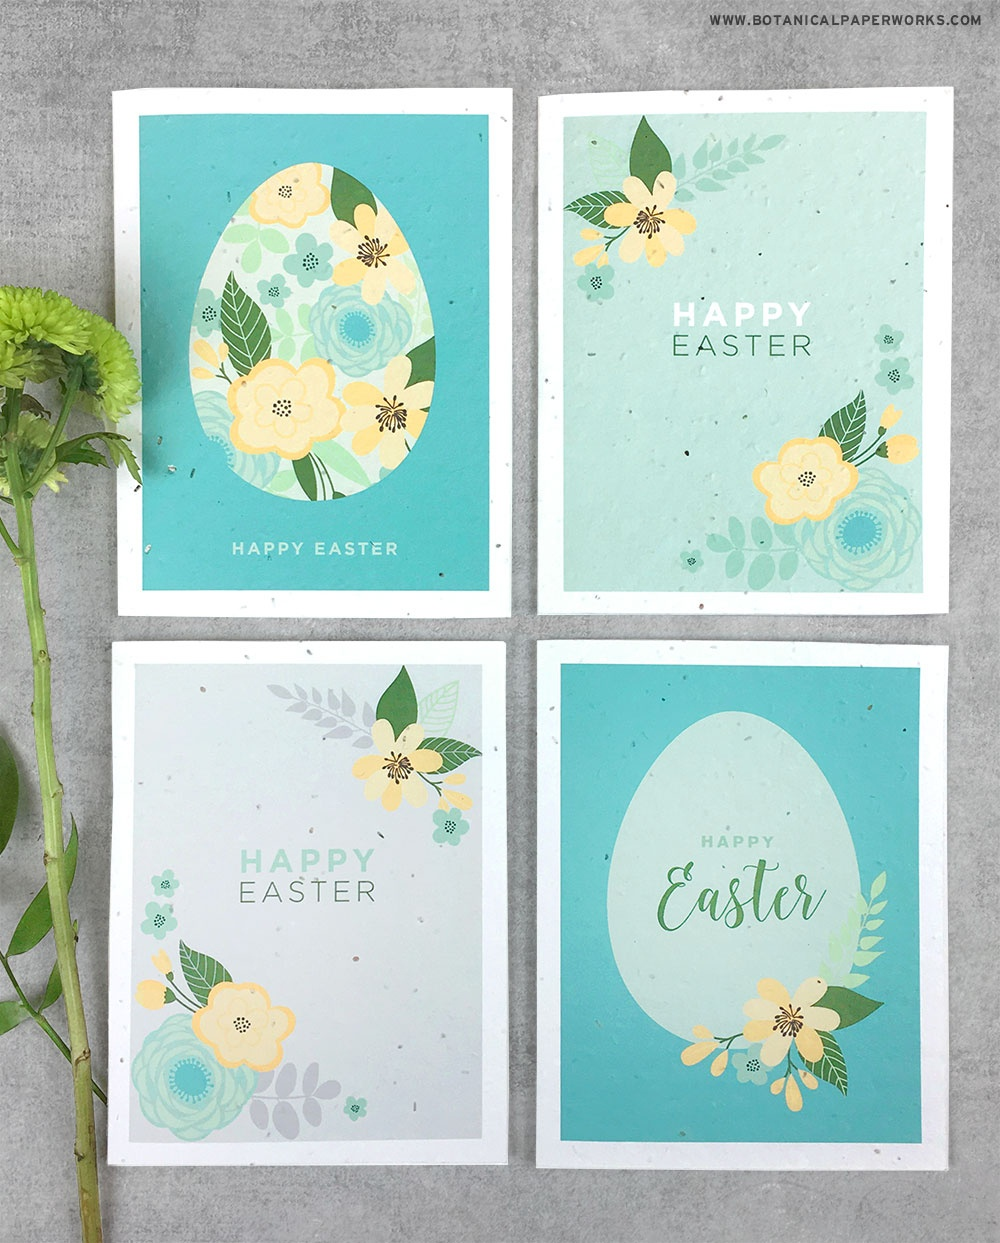 Free Printable} Easter Cards | Blog | Botanical Paperworks - Free Printable Cards